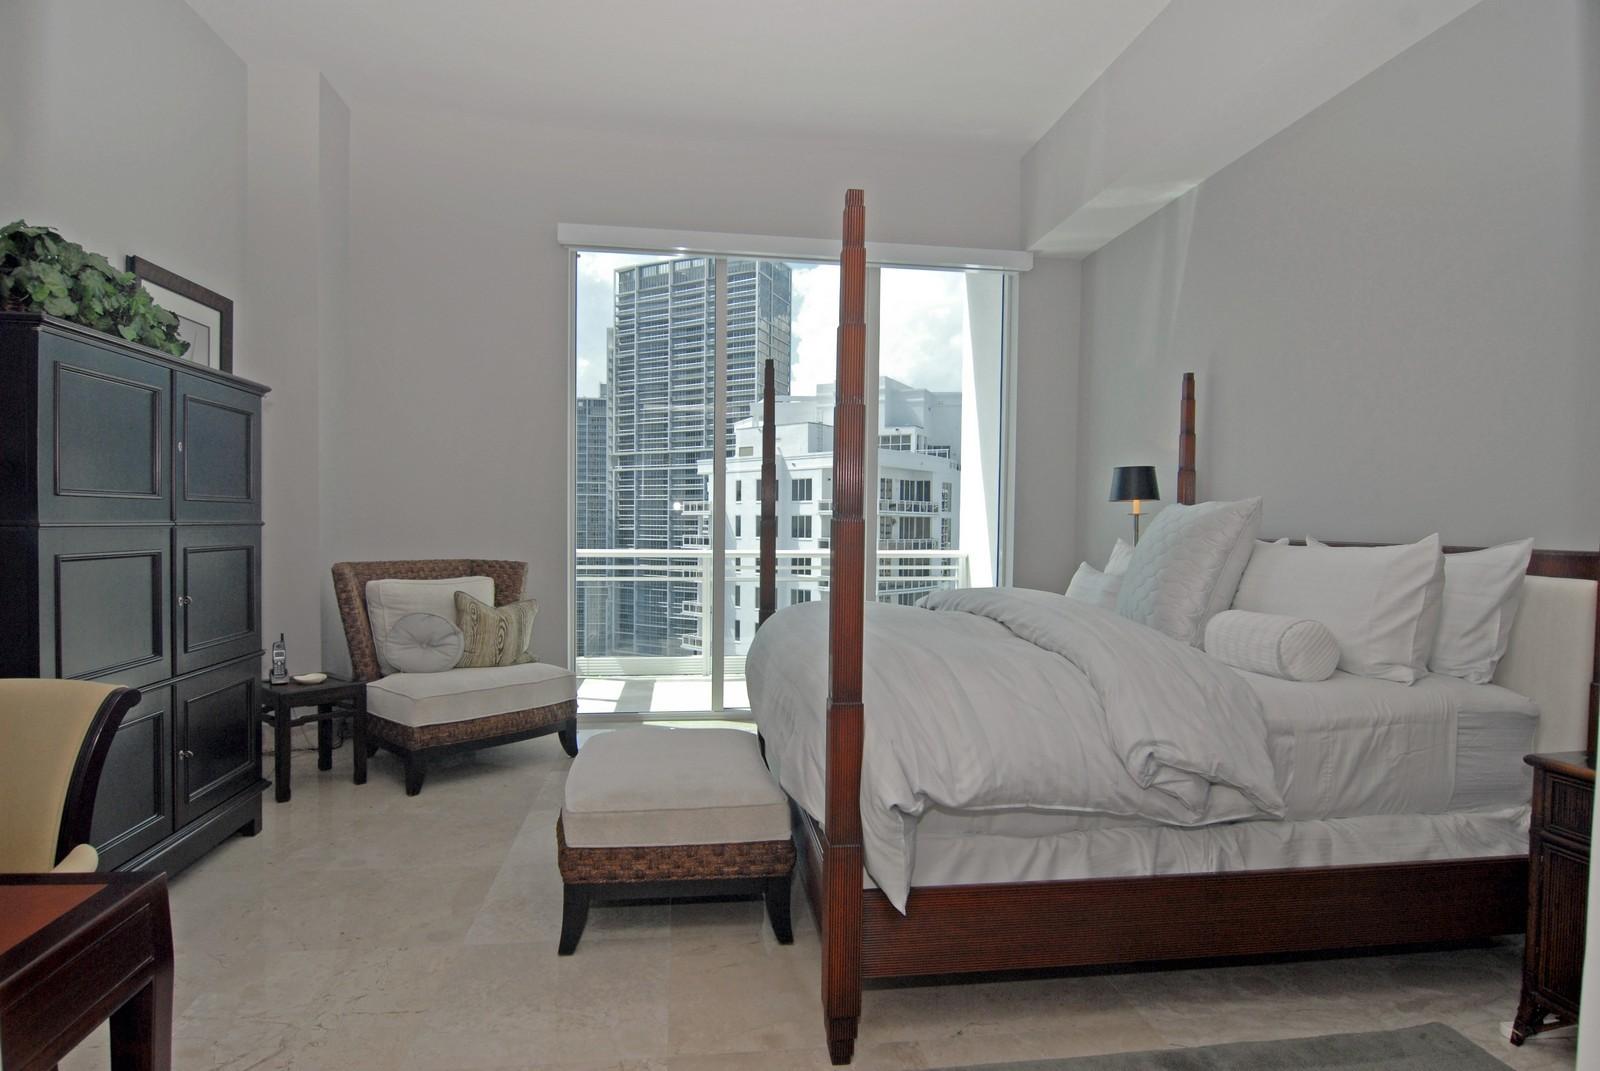 Real Estate Photography - 900 Brickell Key Blvd, Apt 3004, Miami, FL, 33131 - Master Bedroom